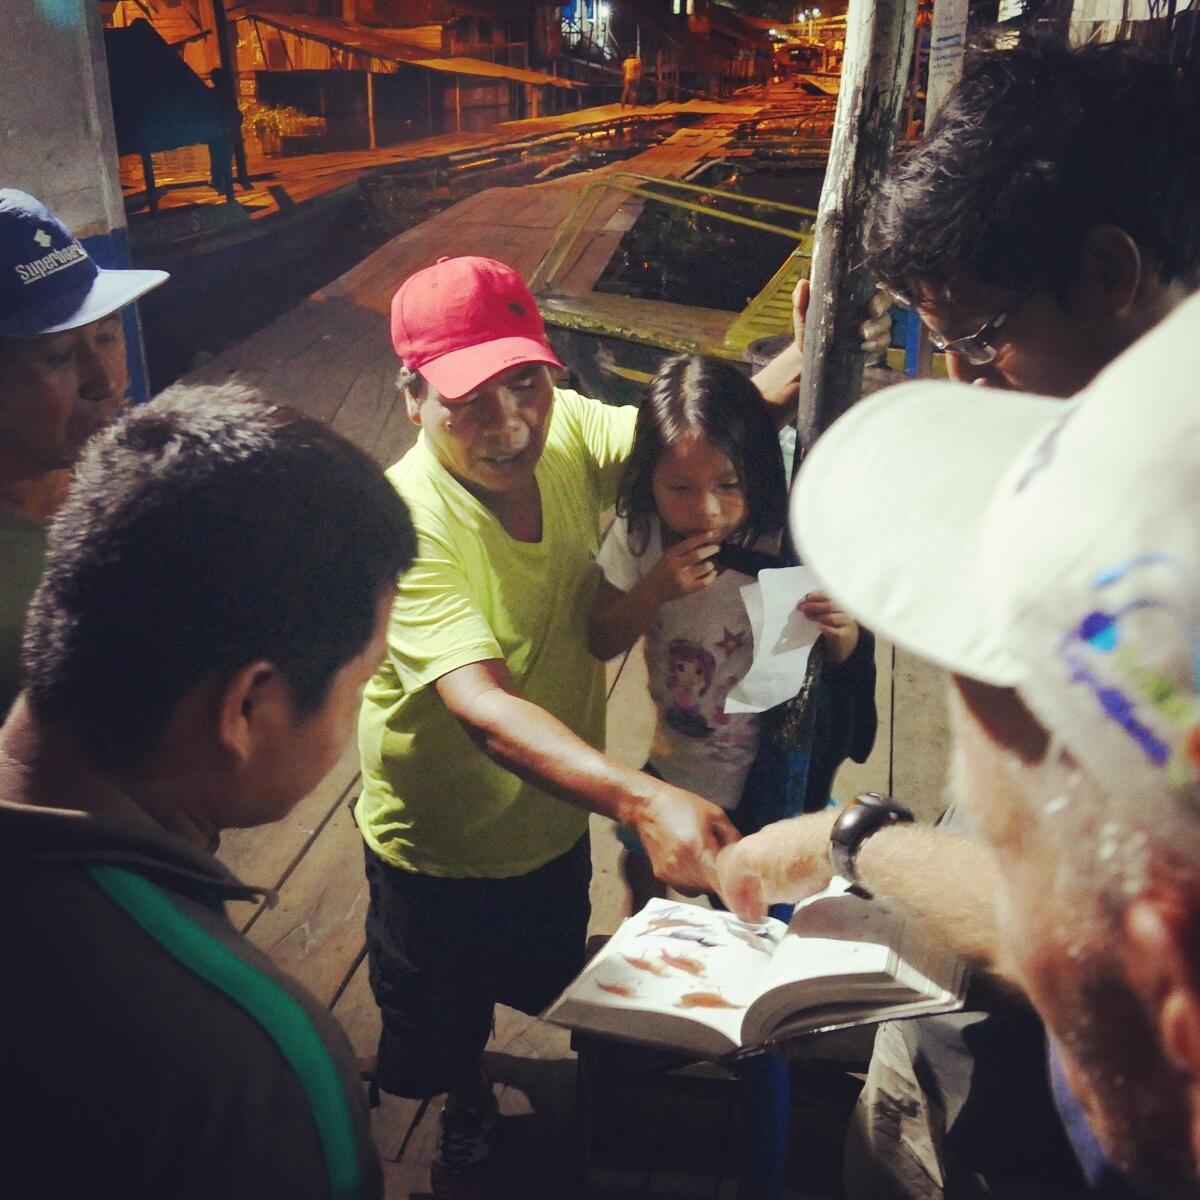 Locals check out a bird book in Iquitos, Peru. Noah Strycker